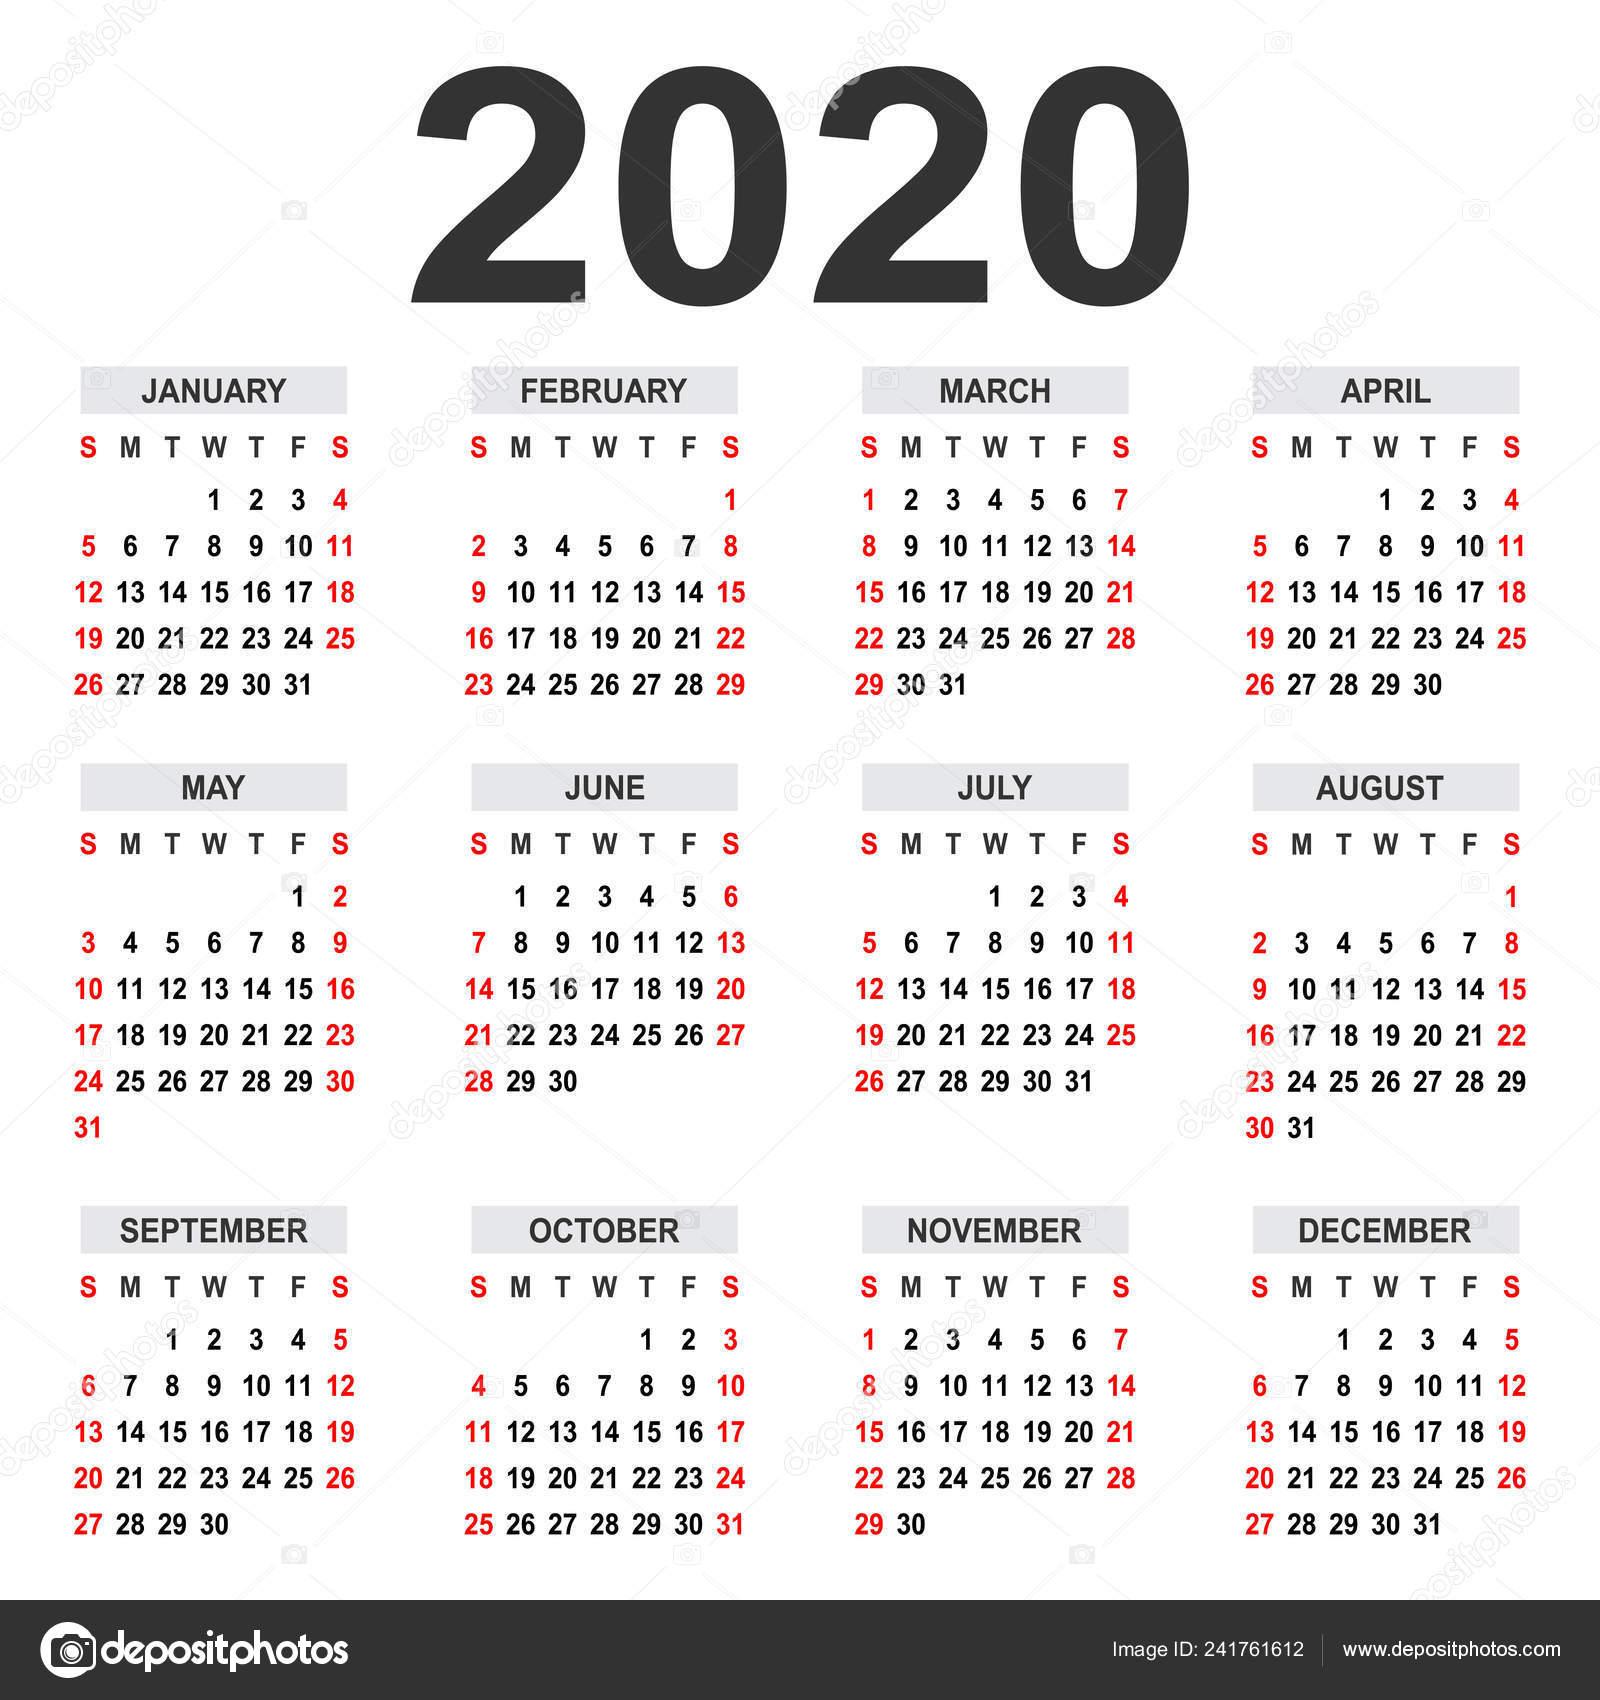 Calendario 2020 Semanas.Calendario 2020 Semana Comeca Domingo Grade Basica Modelo